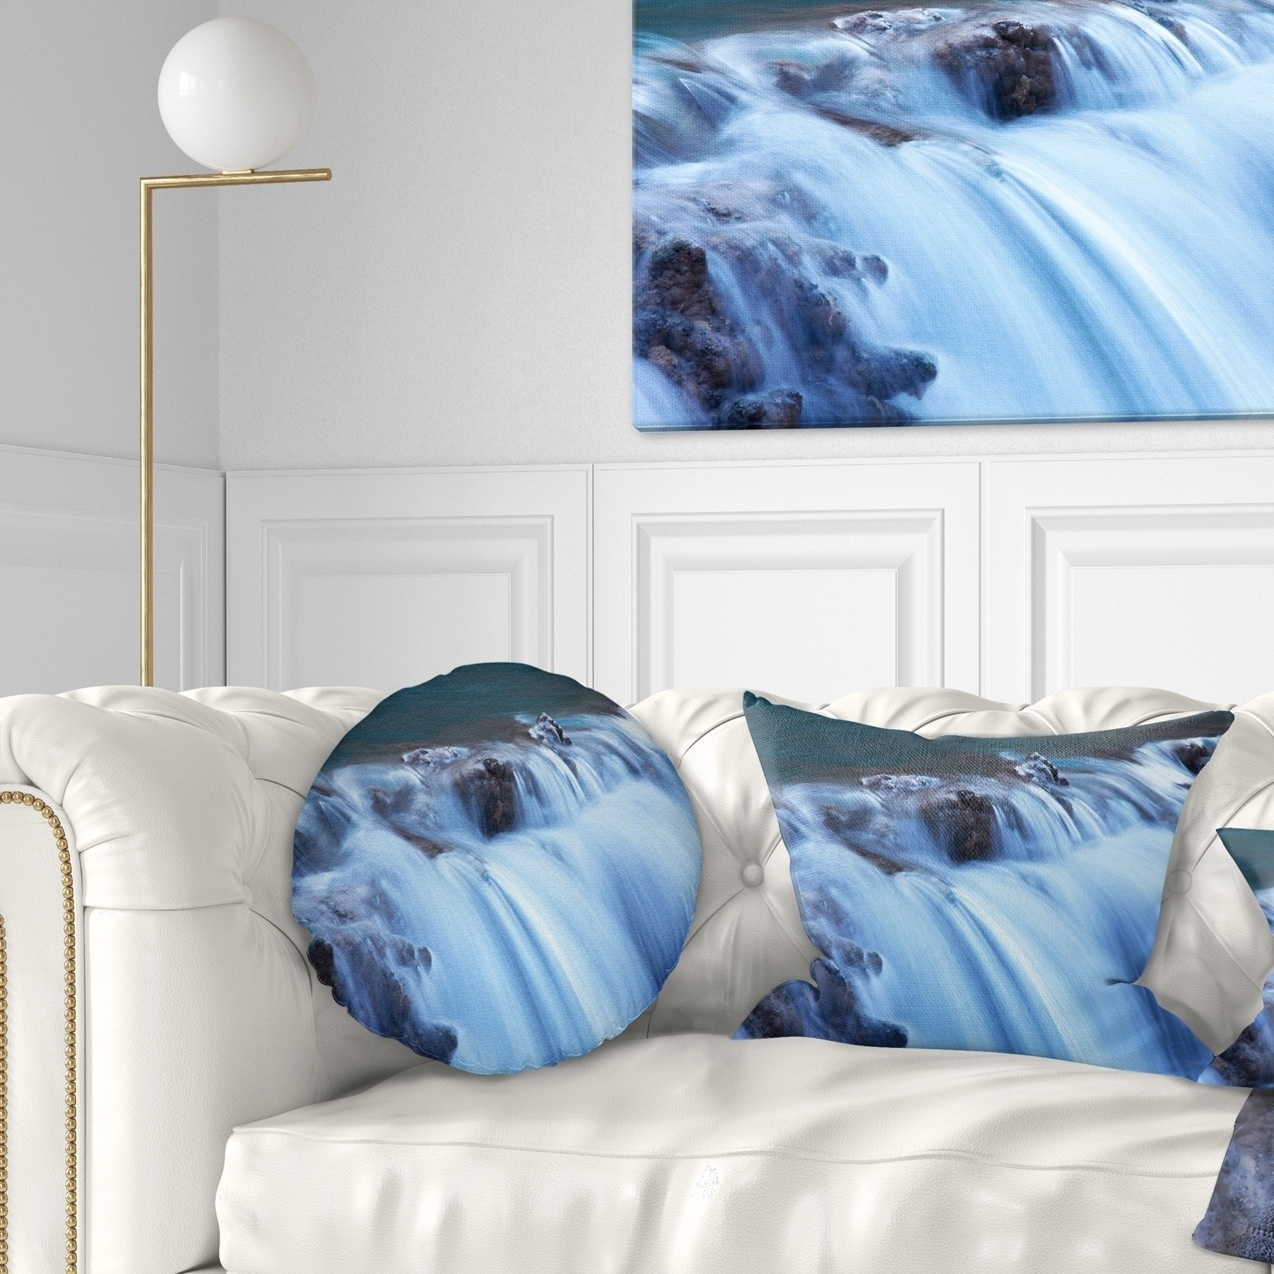 Design Art Designart Fantastic Blue Water Cascade Landscape Printed Throw Pillow Walmart Com Walmart Com